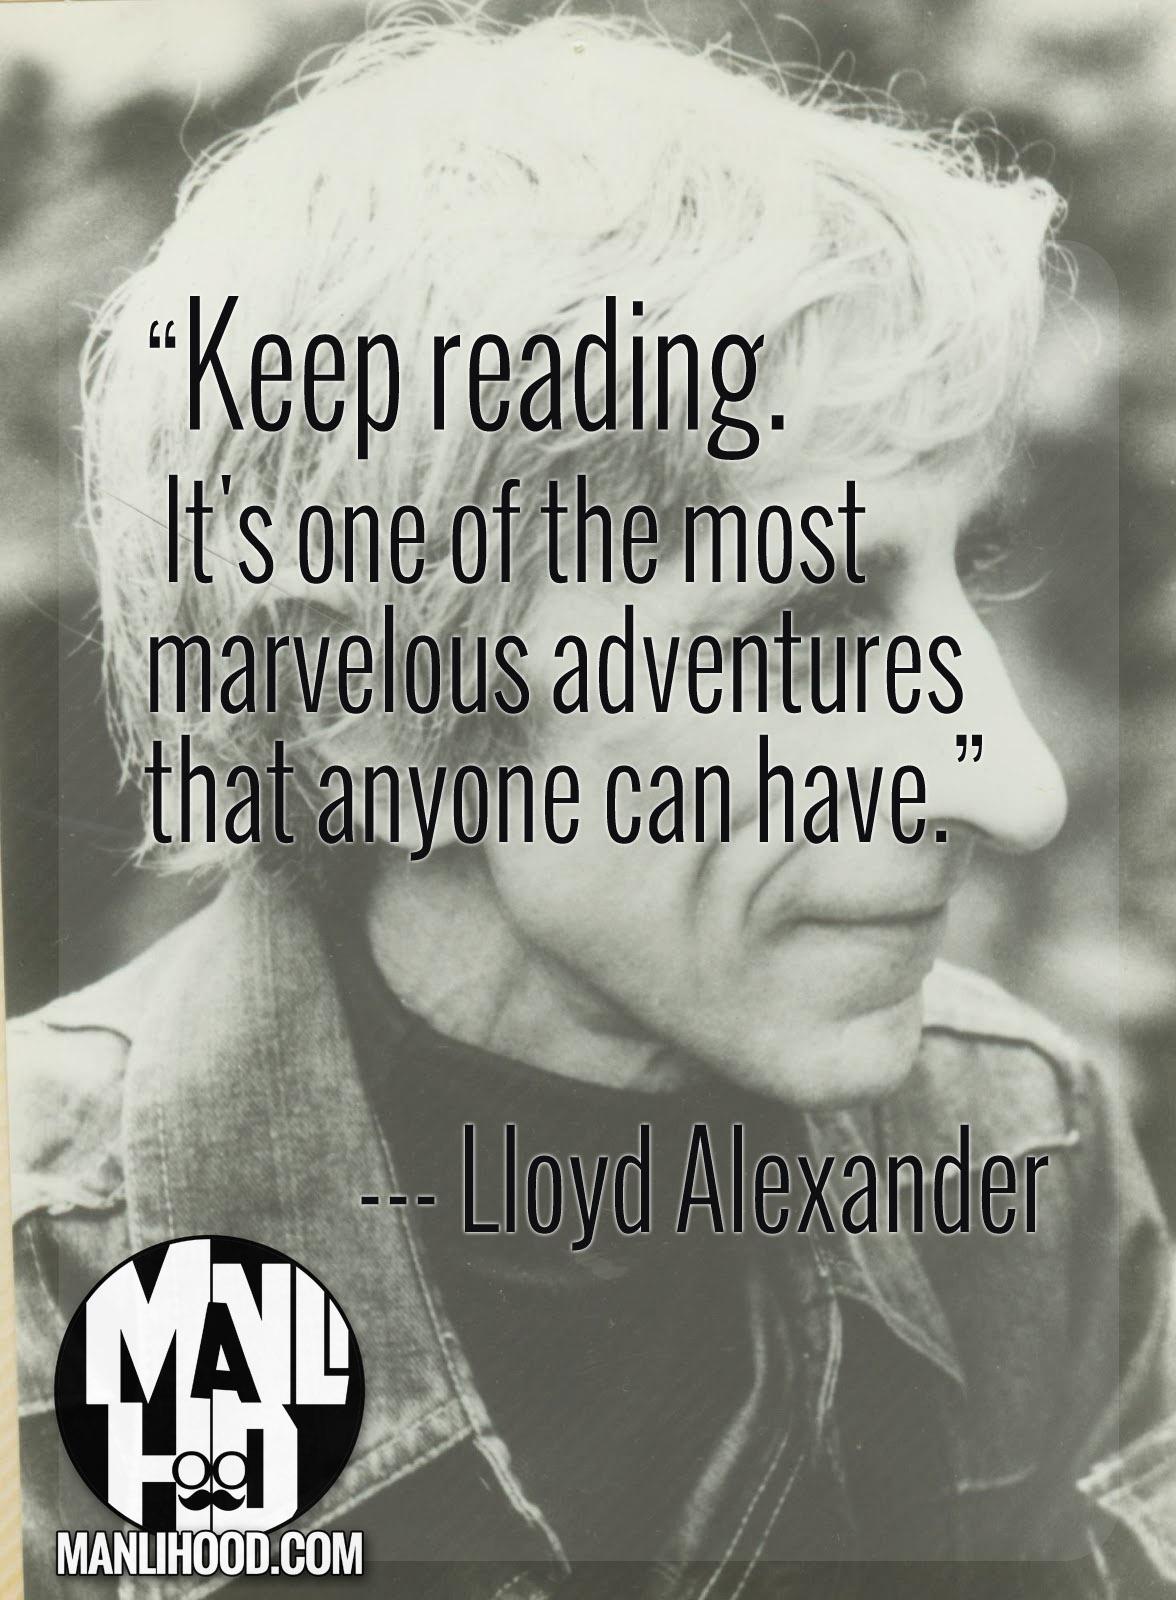 Lloyd Alexander